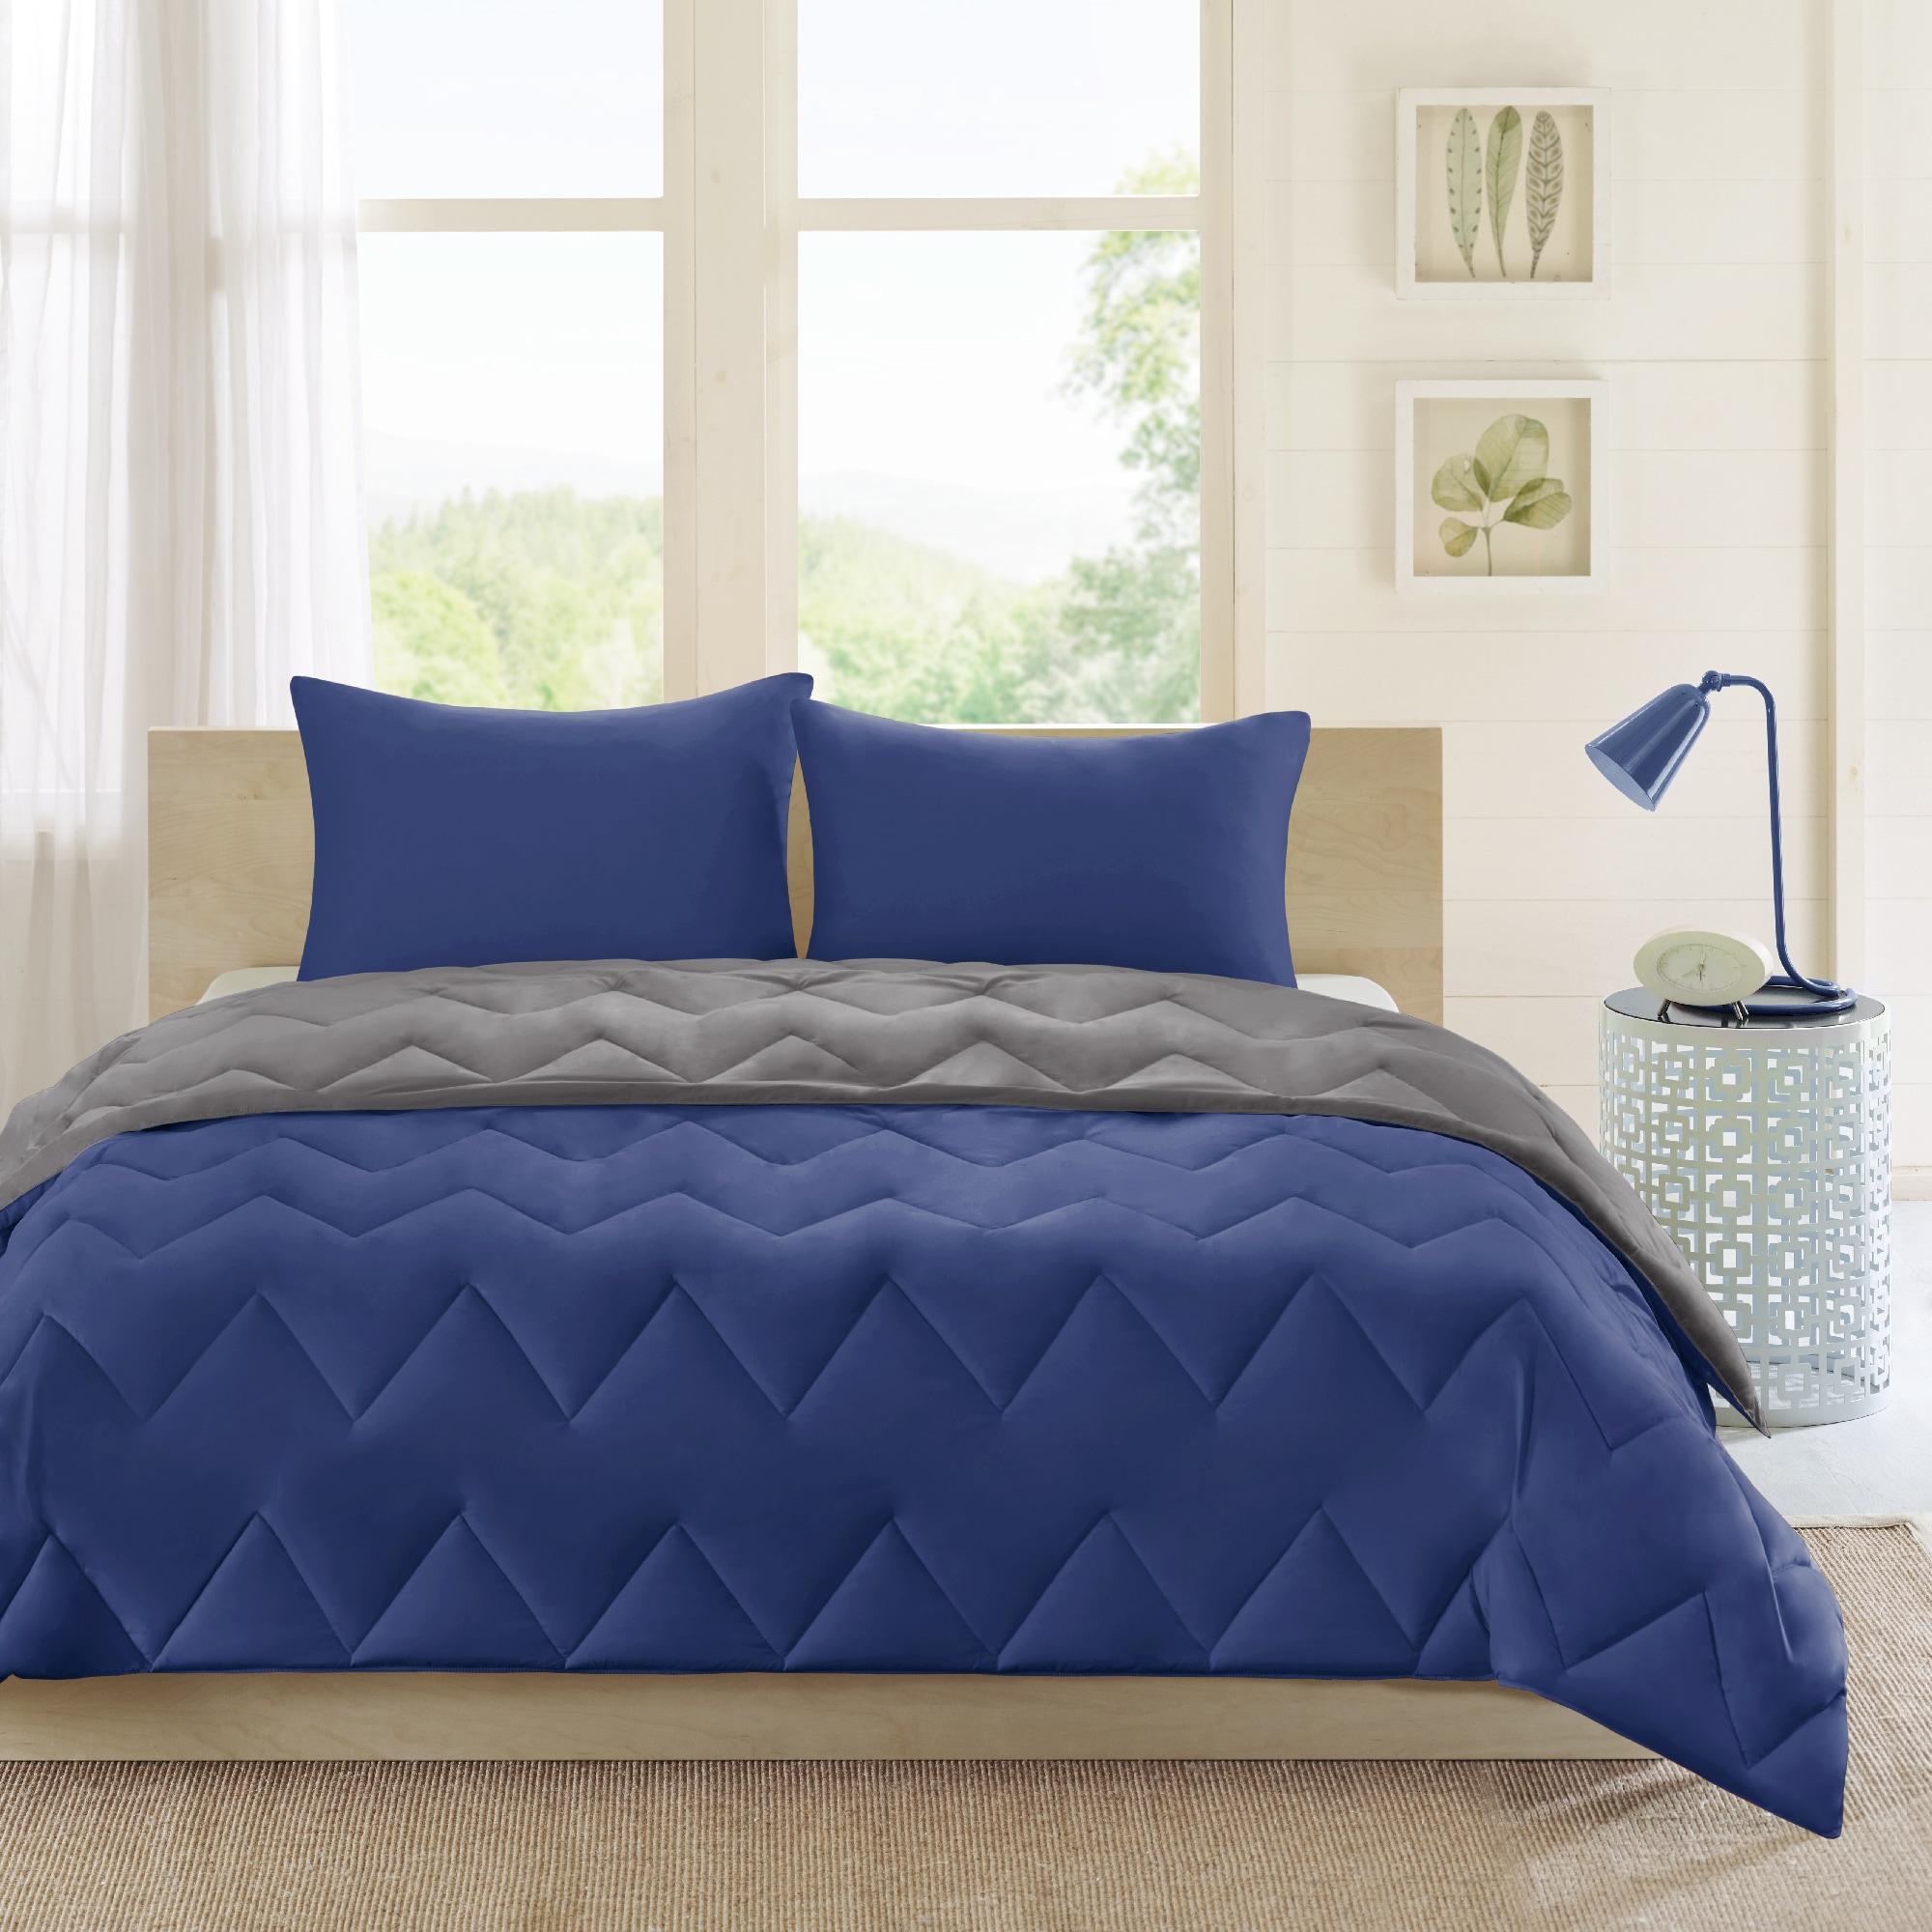 Intelligent Design Penny Reversible Down Alternative Comforter